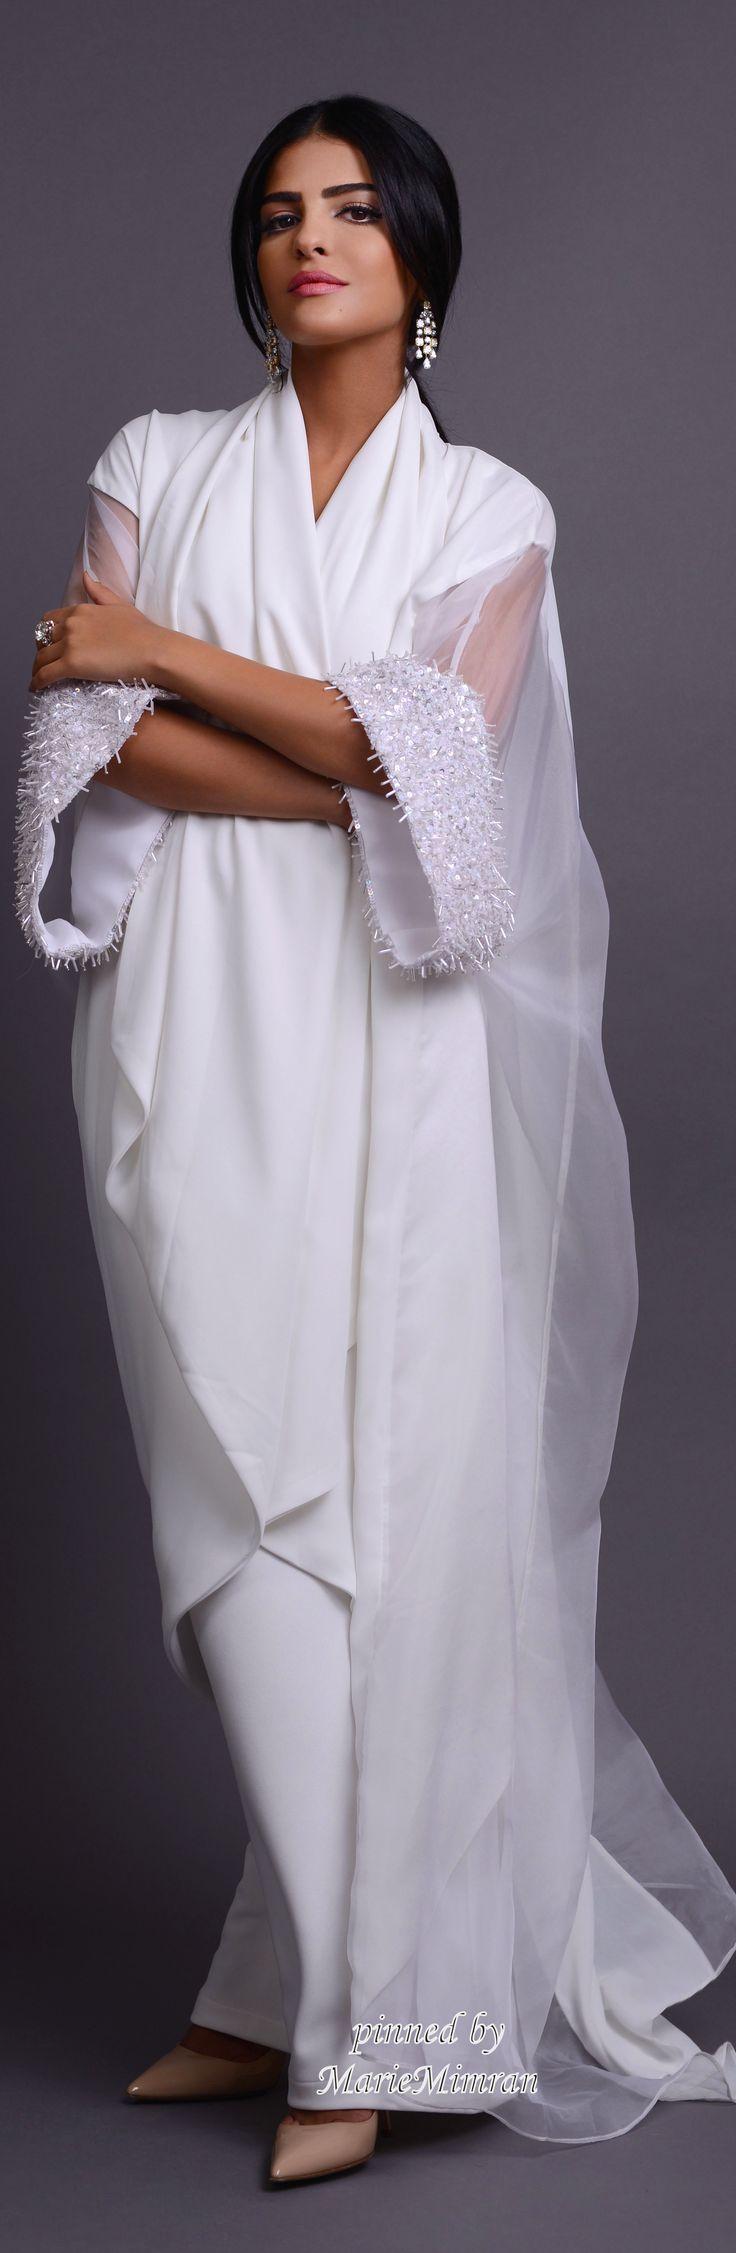 Princesse Ameerah Al Taweel- By FREDERIC ARANDA (Photographer)_Wear Bisht by Mashael Al Rahy Designer for Nargis magazine-